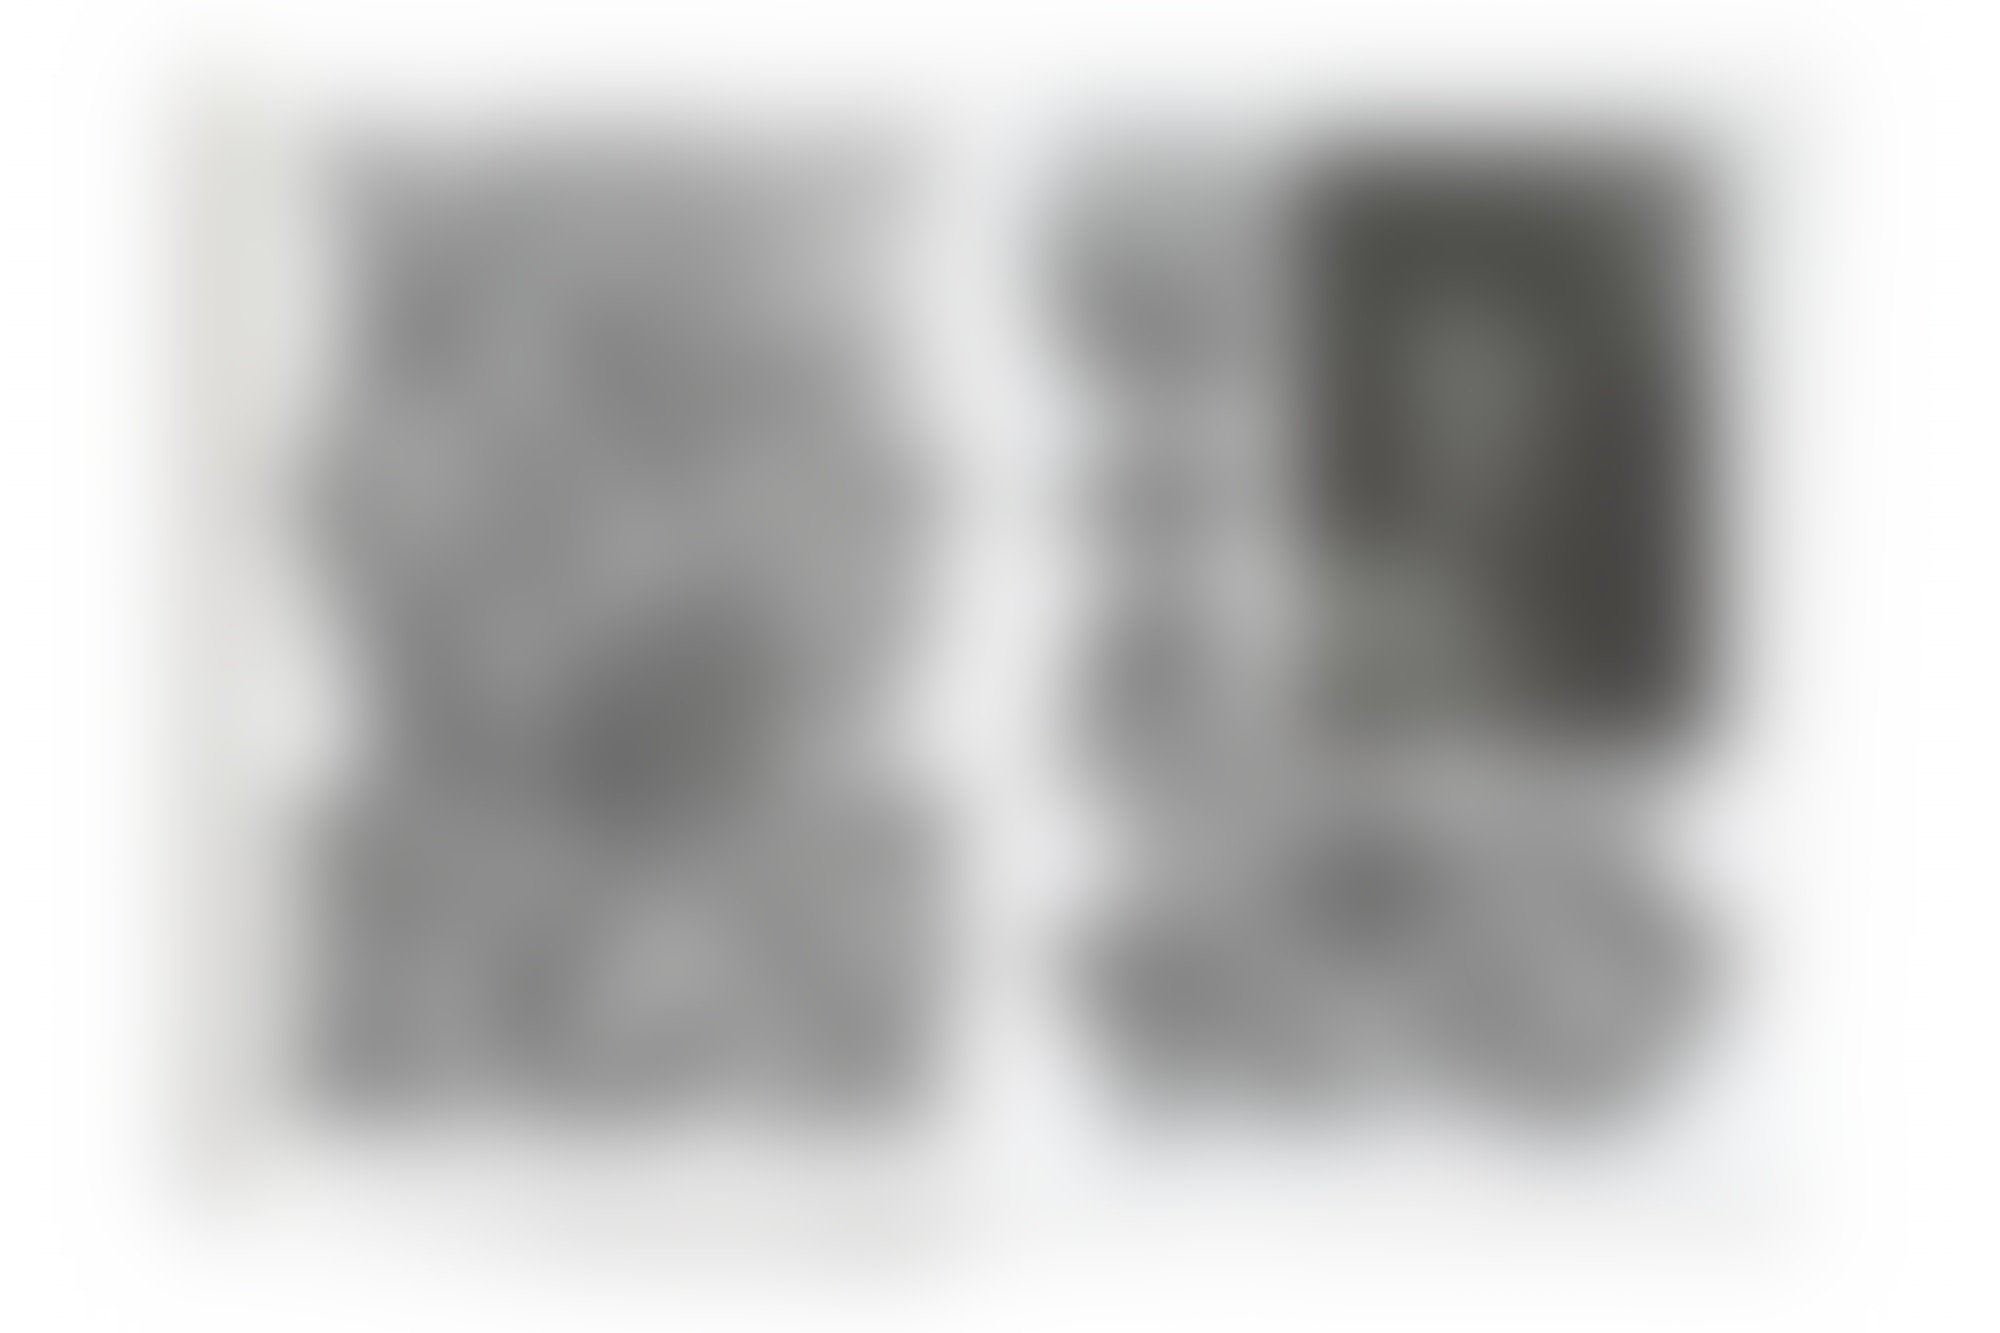 Rough Trade Bruce Portfolio 0011832 autocompressfitresizeixlibphp 1 1 0max h2000max w3 D2000q80s7520ab44f90907c50bdcc5f89655328e